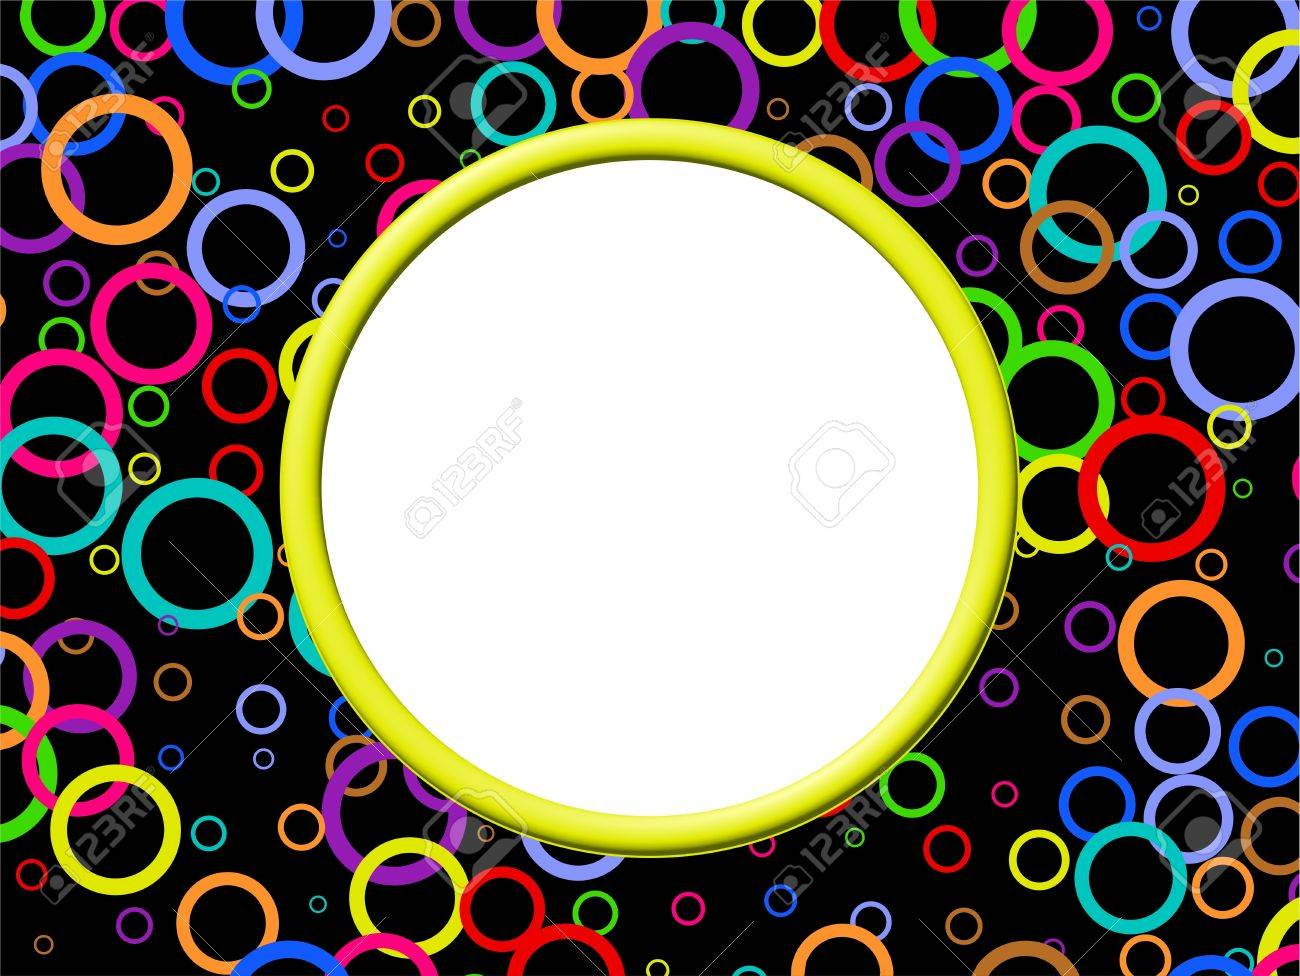 Artistic abstract photo border frame design with lots of colourful artistic abstract photo border frame design with lots of colourful retro rings stock photo jeuxipadfo Choice Image